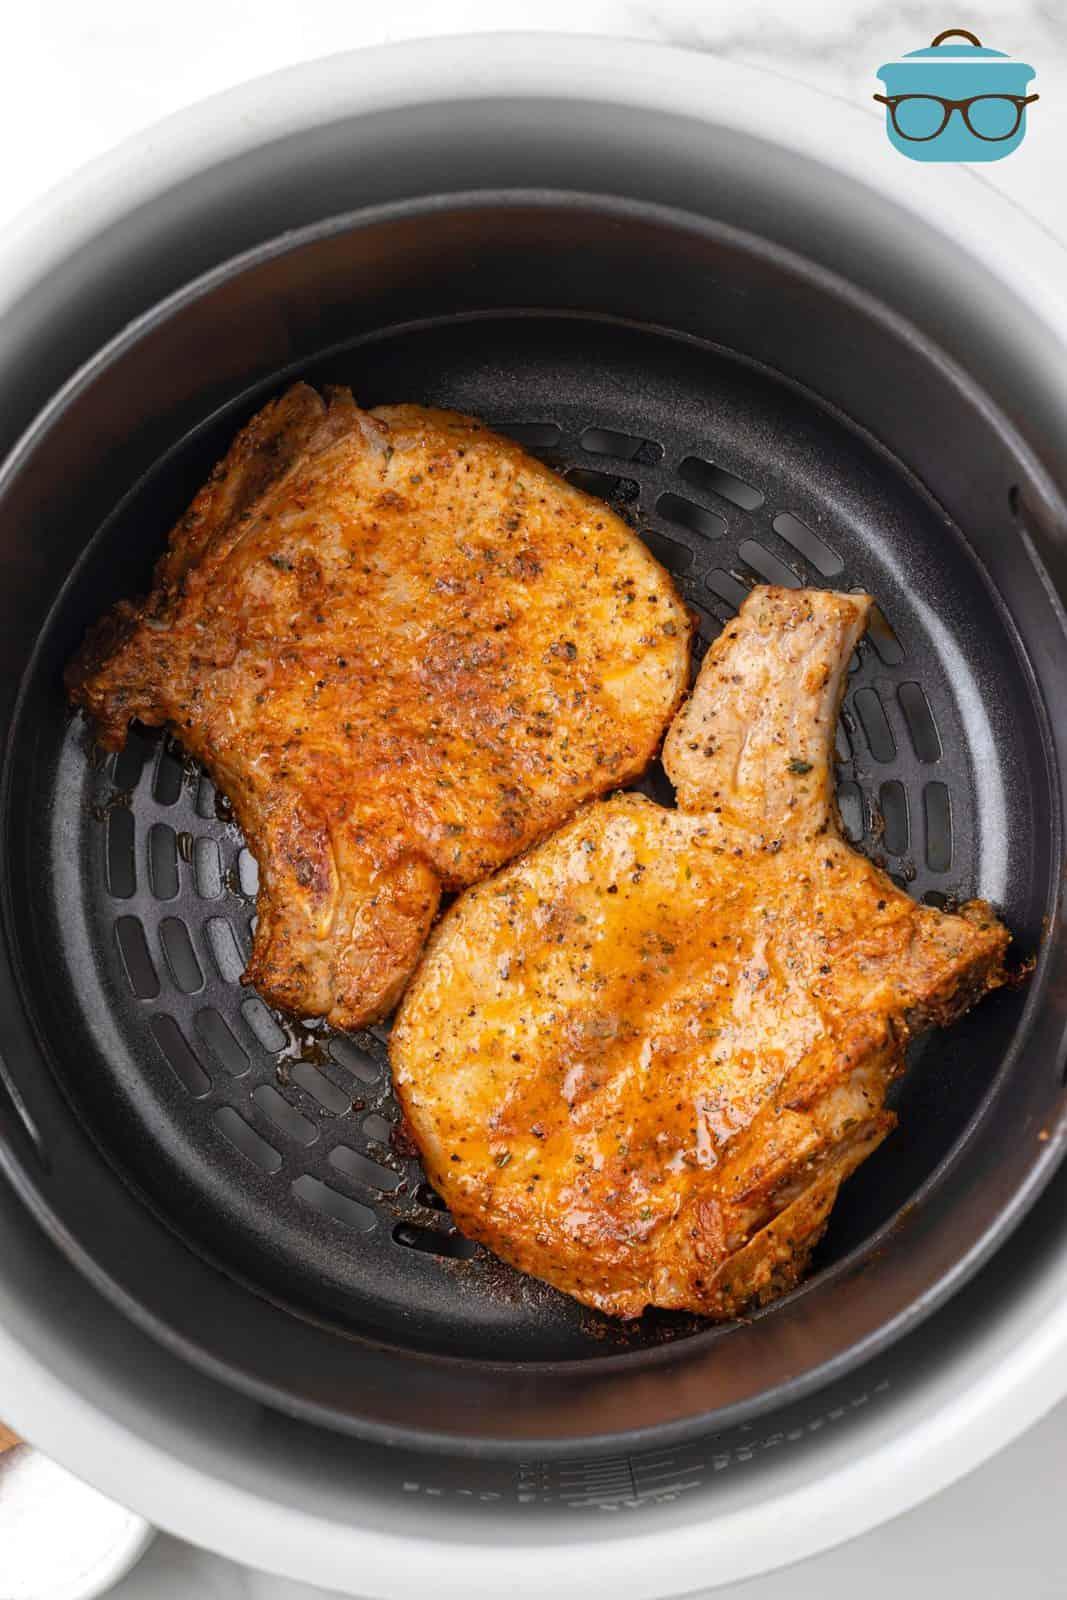 Cooked pork chops in air fryer.